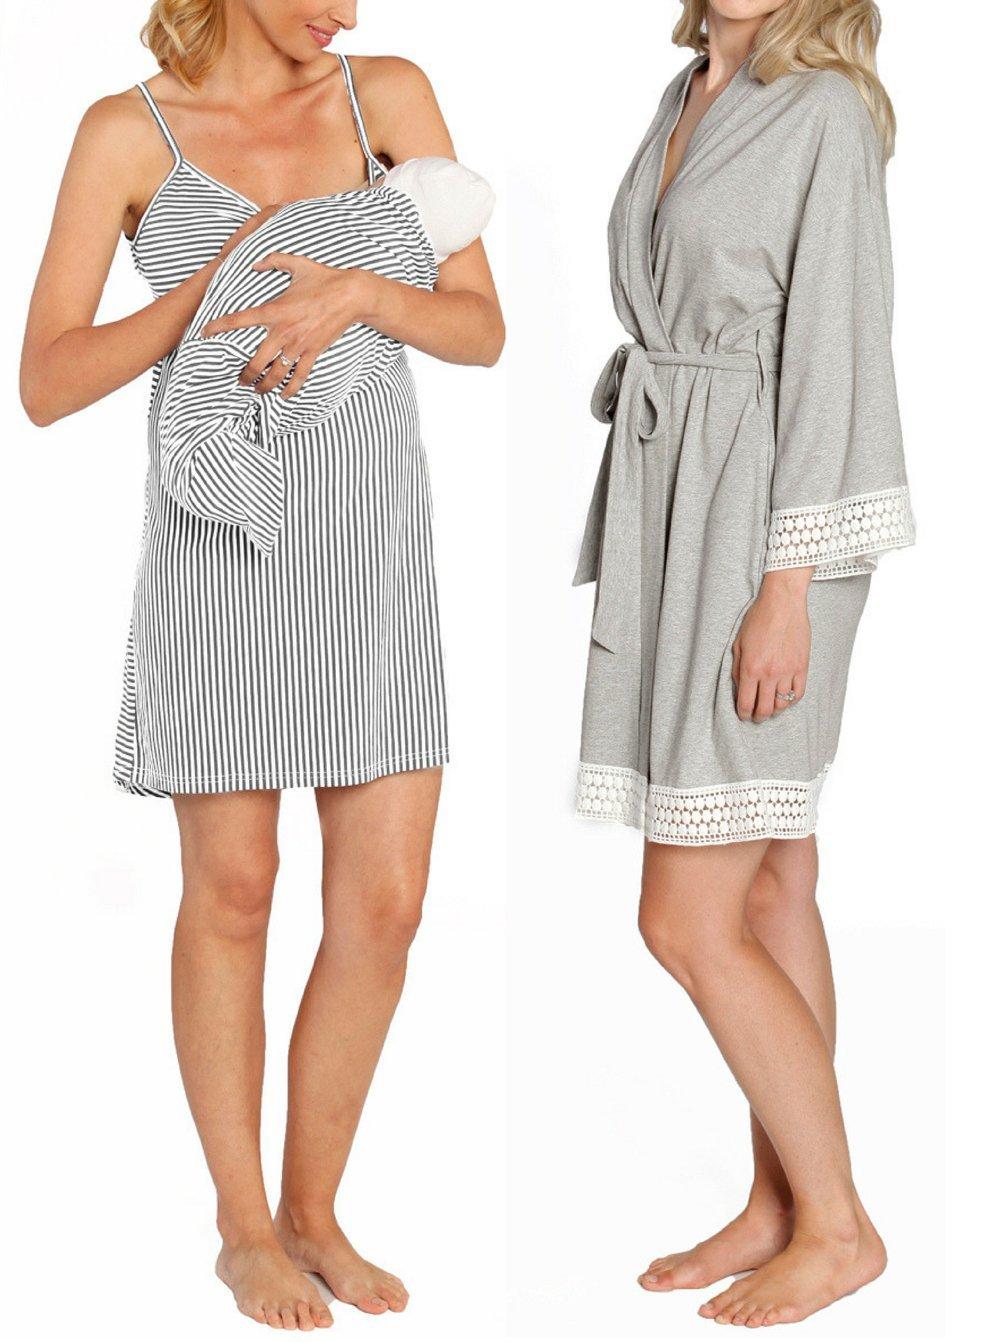 Angel Maternity - Hospital Pack Nursing Dress Hospital Robe + Receiving Baby Blanket Maternity and Nursing kit in Grey - L